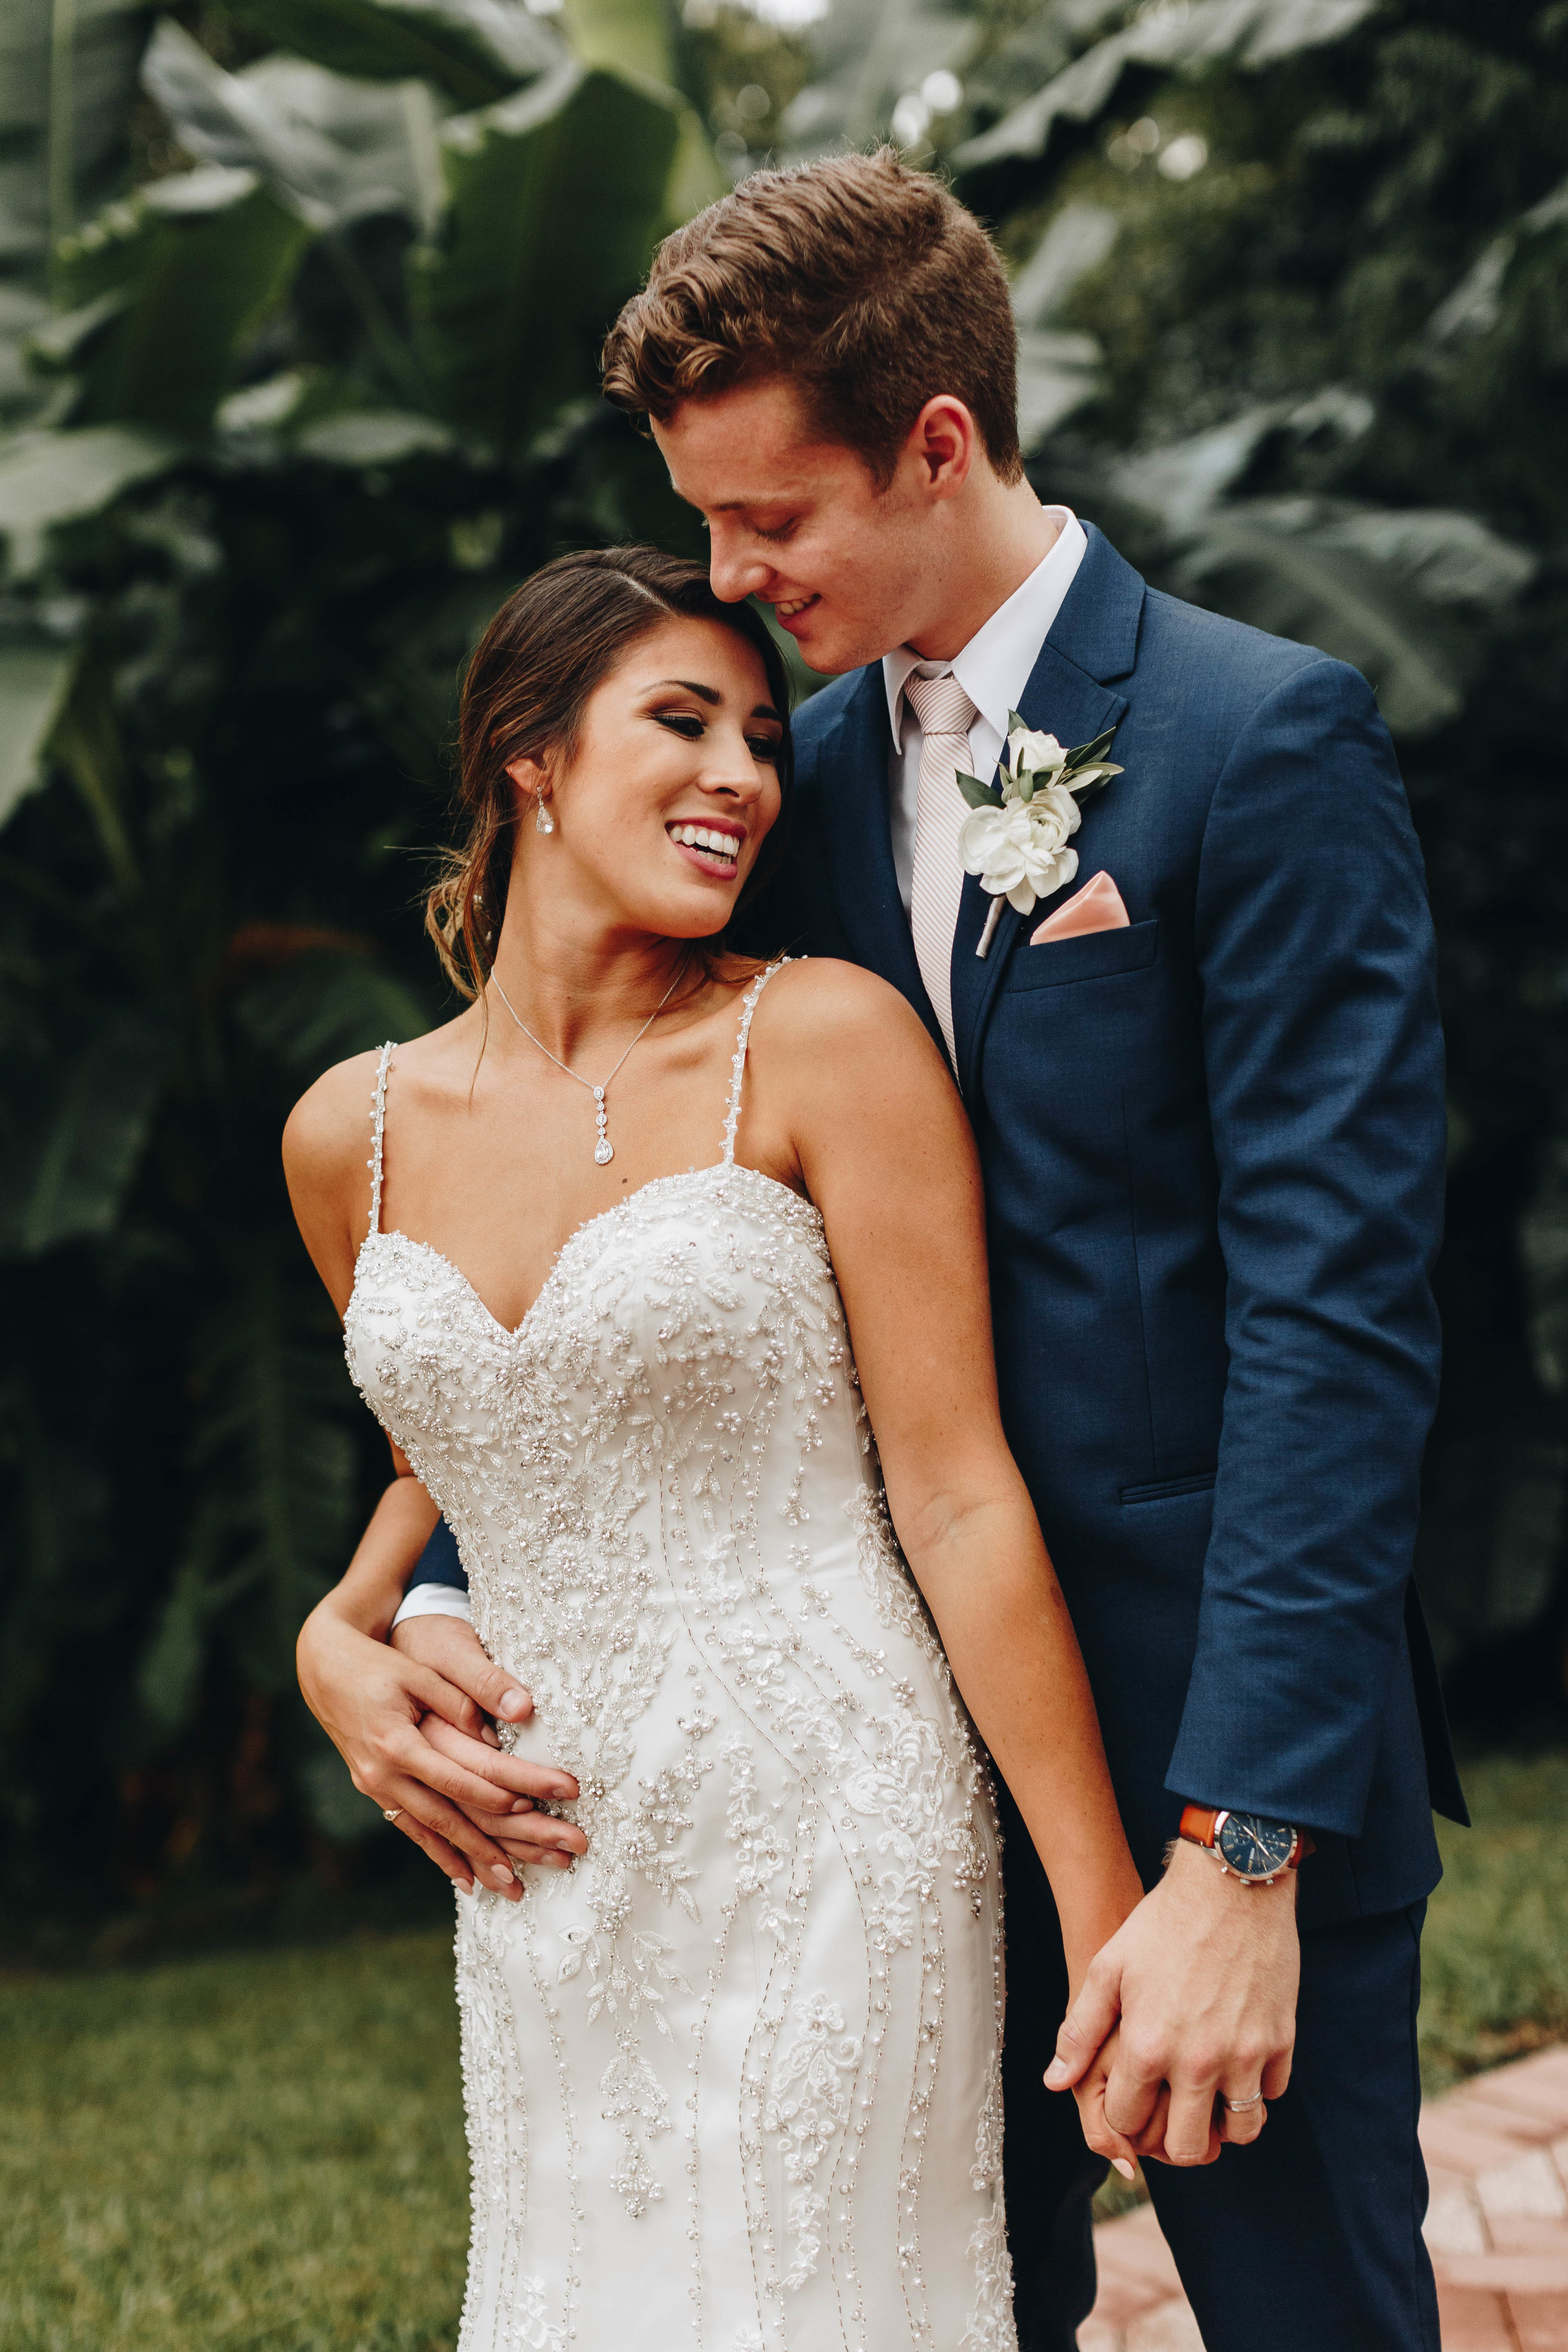 41f70-luxmoregrandestatewedding.jpgluxmoregrandestatewedding.jpg